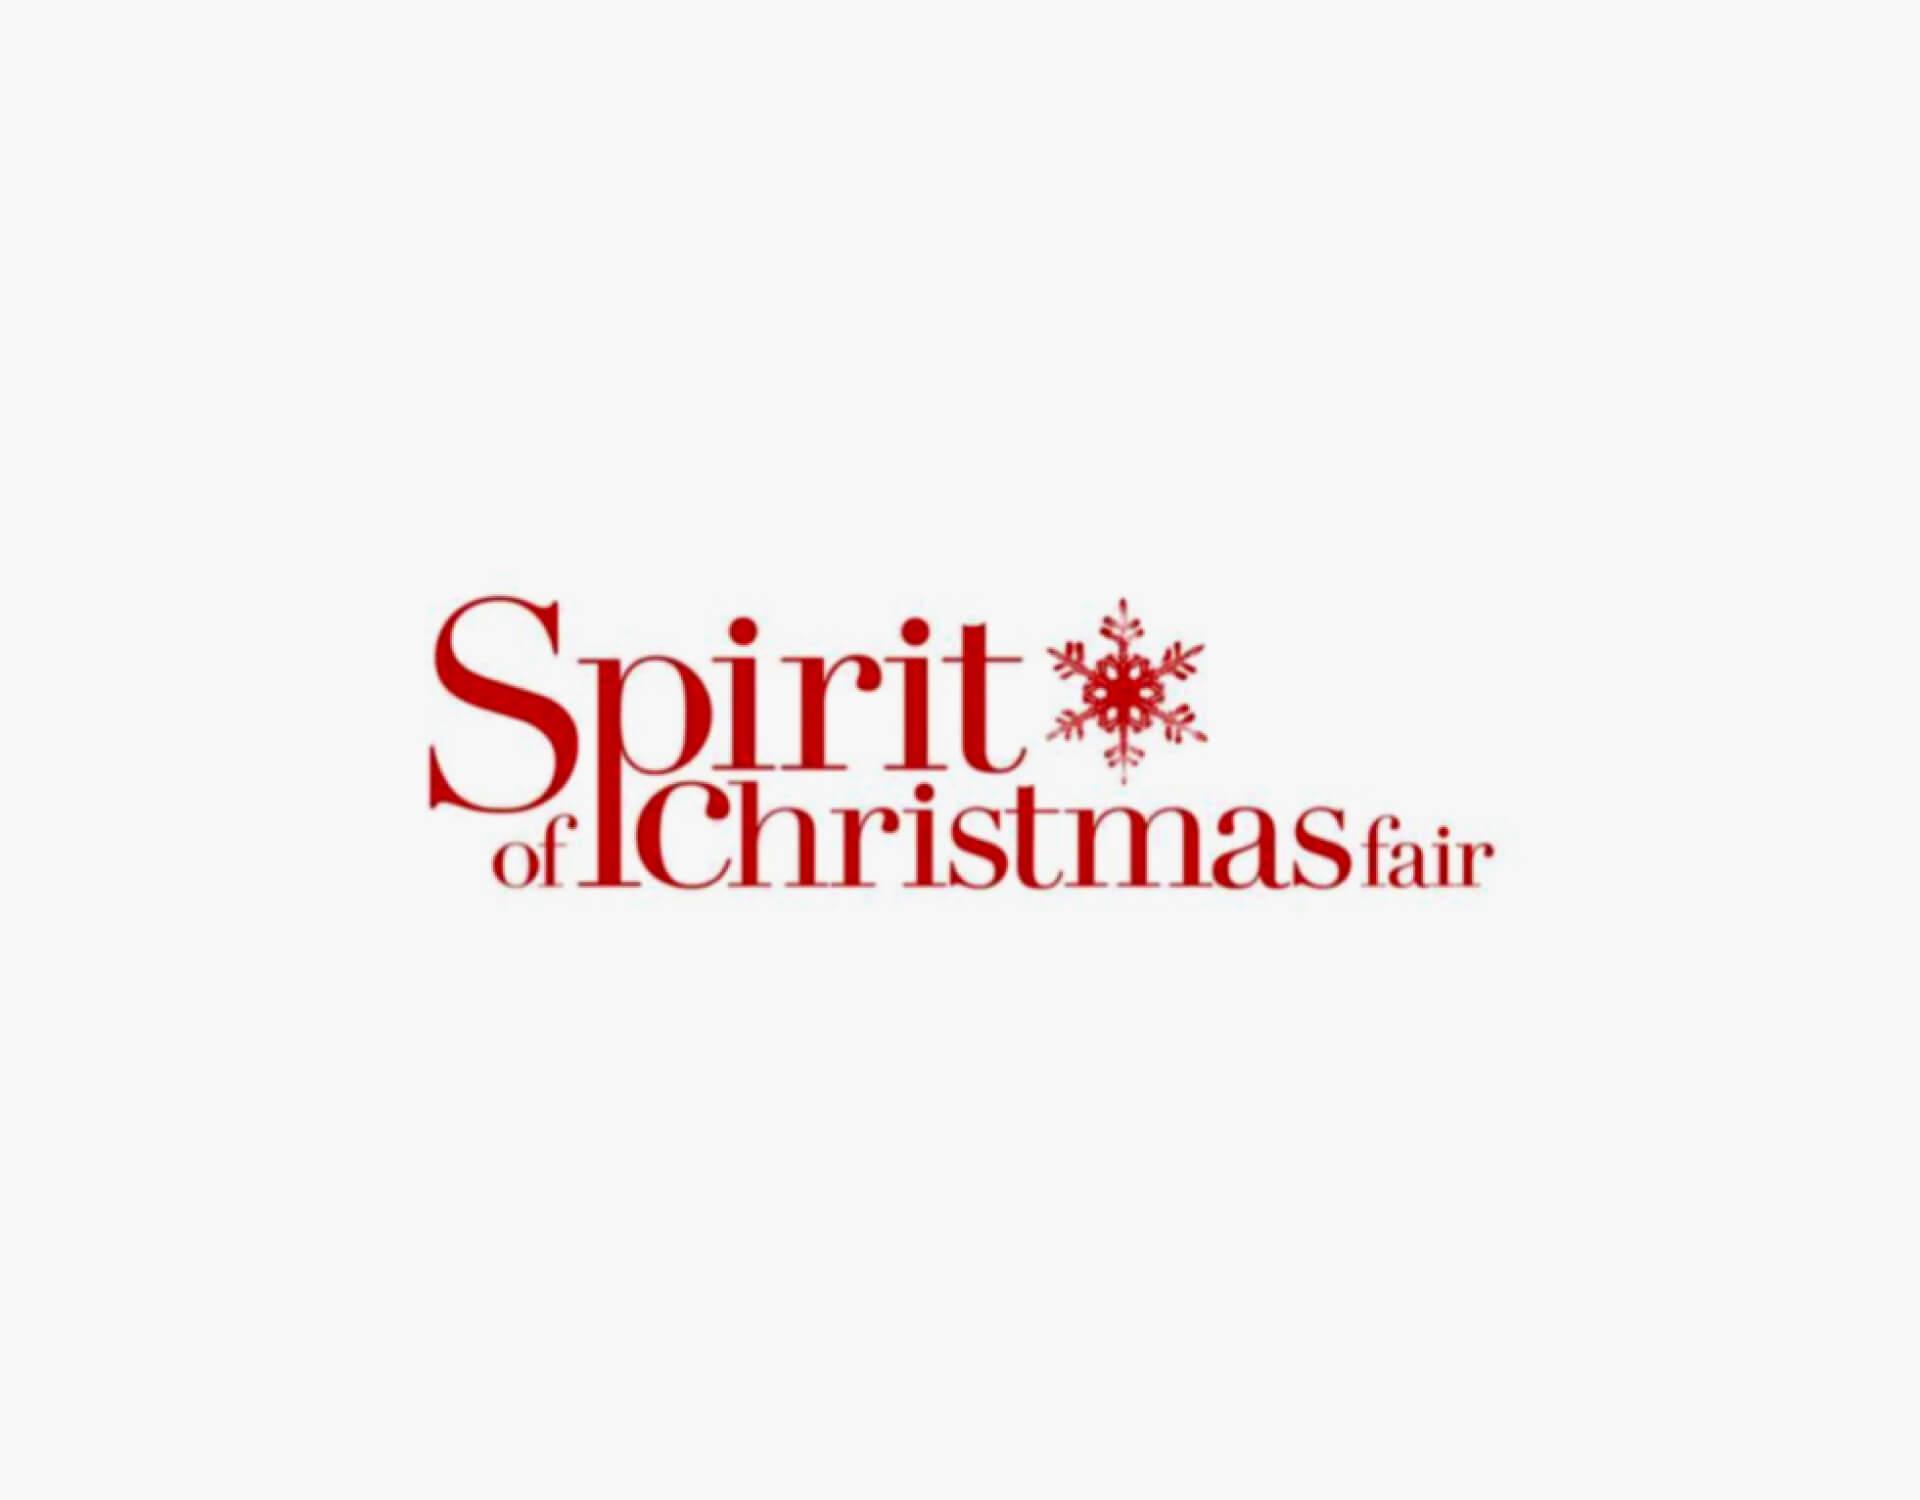 Spirit of Christmas, Olympia London